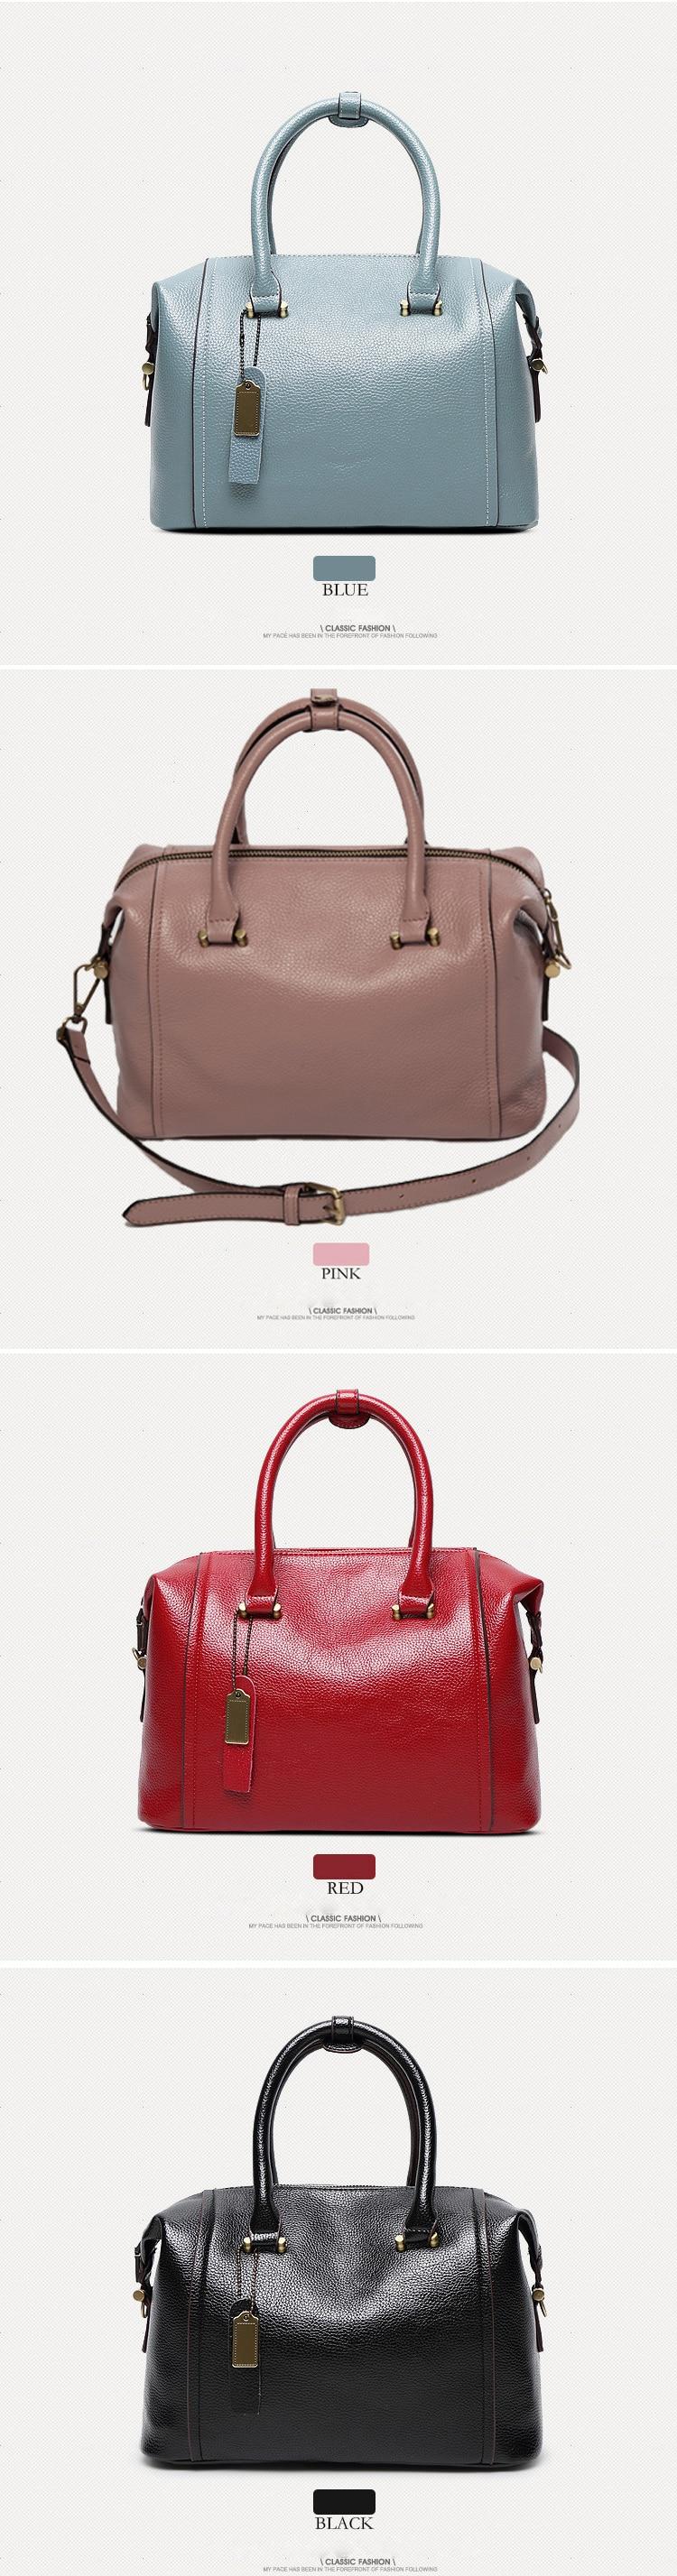 women-handbag10.1